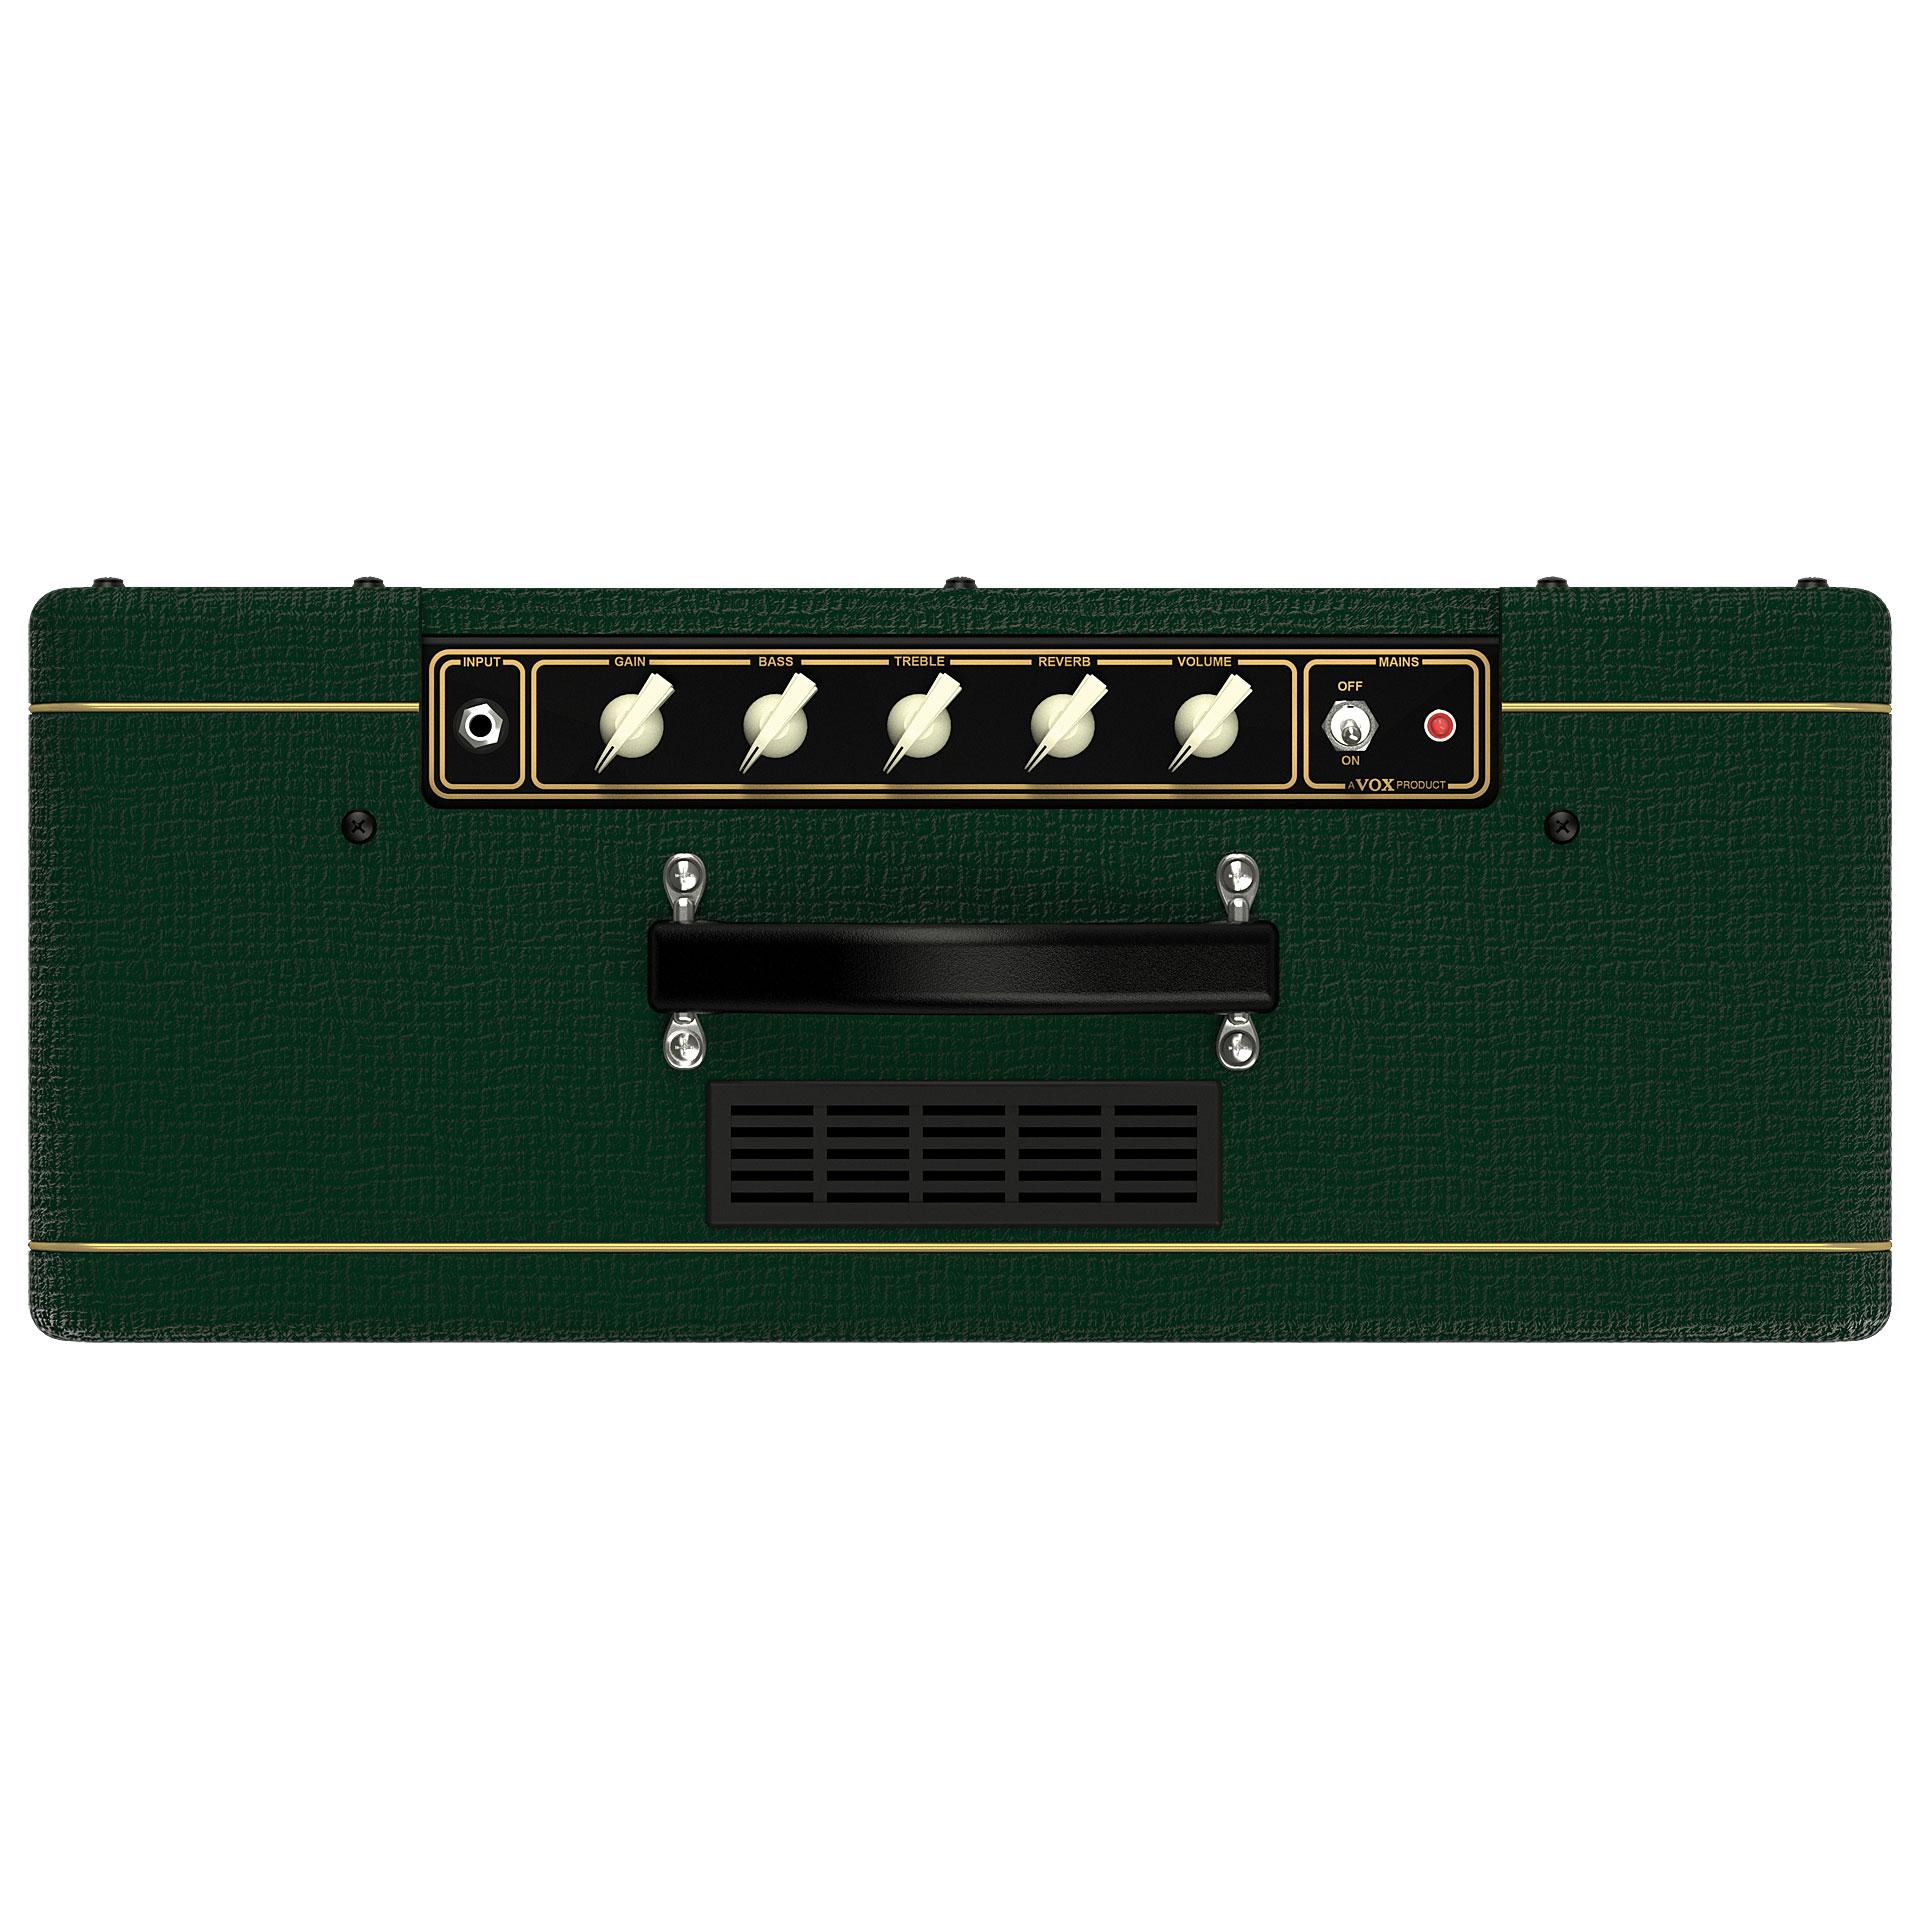 vox ac10 c1 britsih racin green limited edition guitar amp. Black Bedroom Furniture Sets. Home Design Ideas